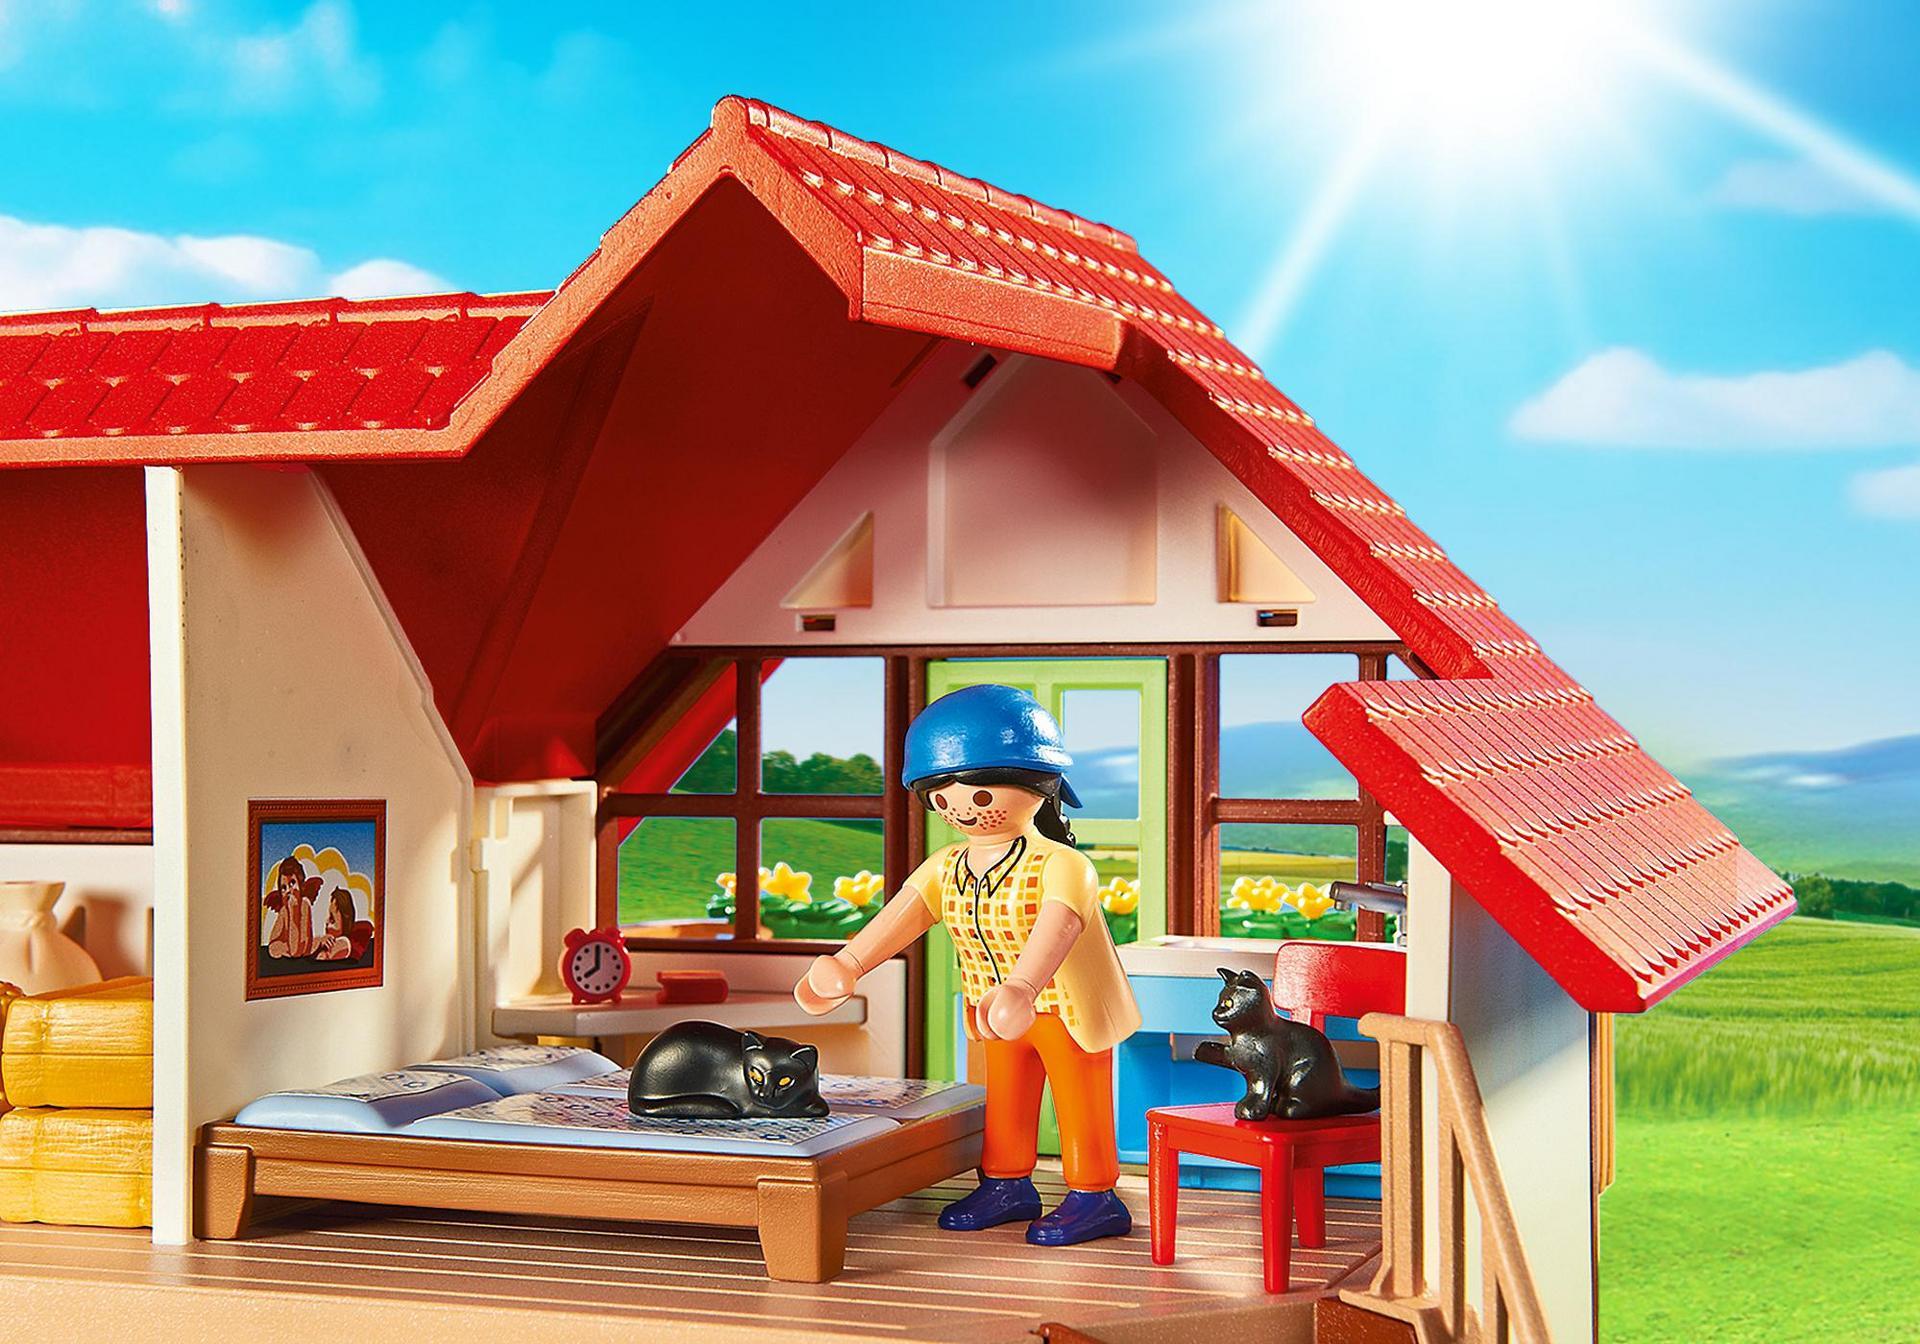 Grande ferme 6120 playmobil france for La granja de playmobil precio